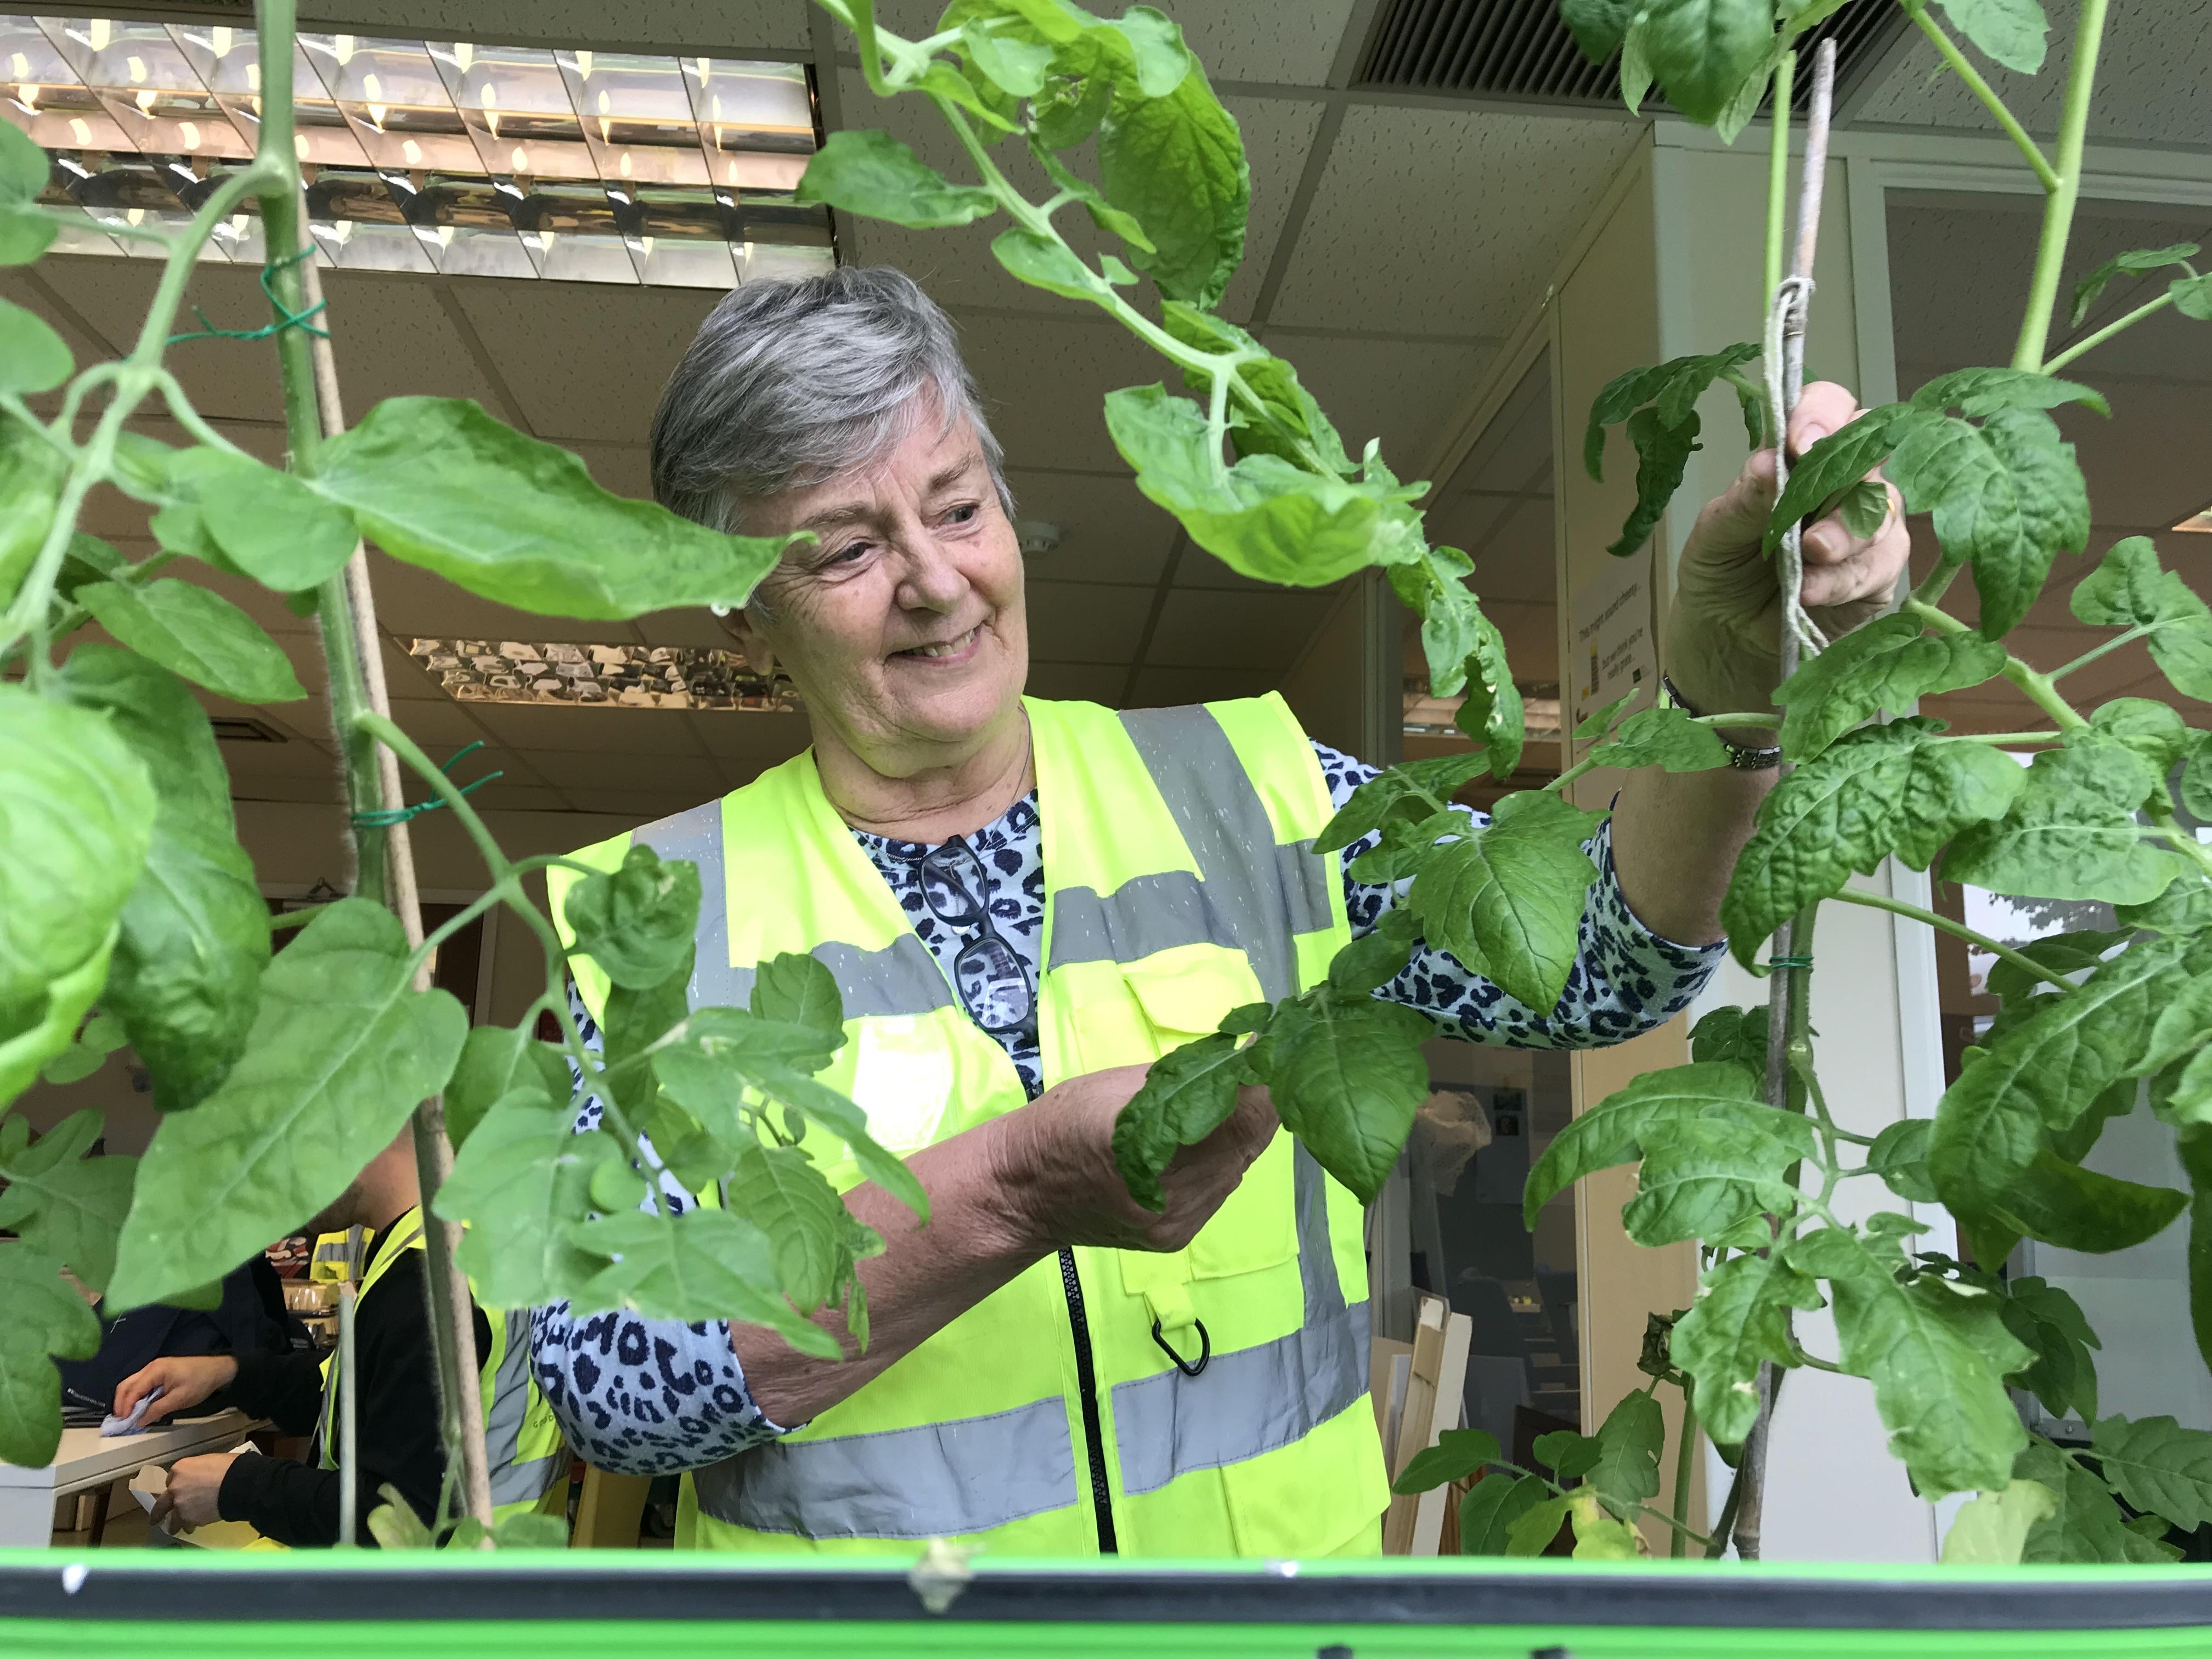 Bernadette gardening club